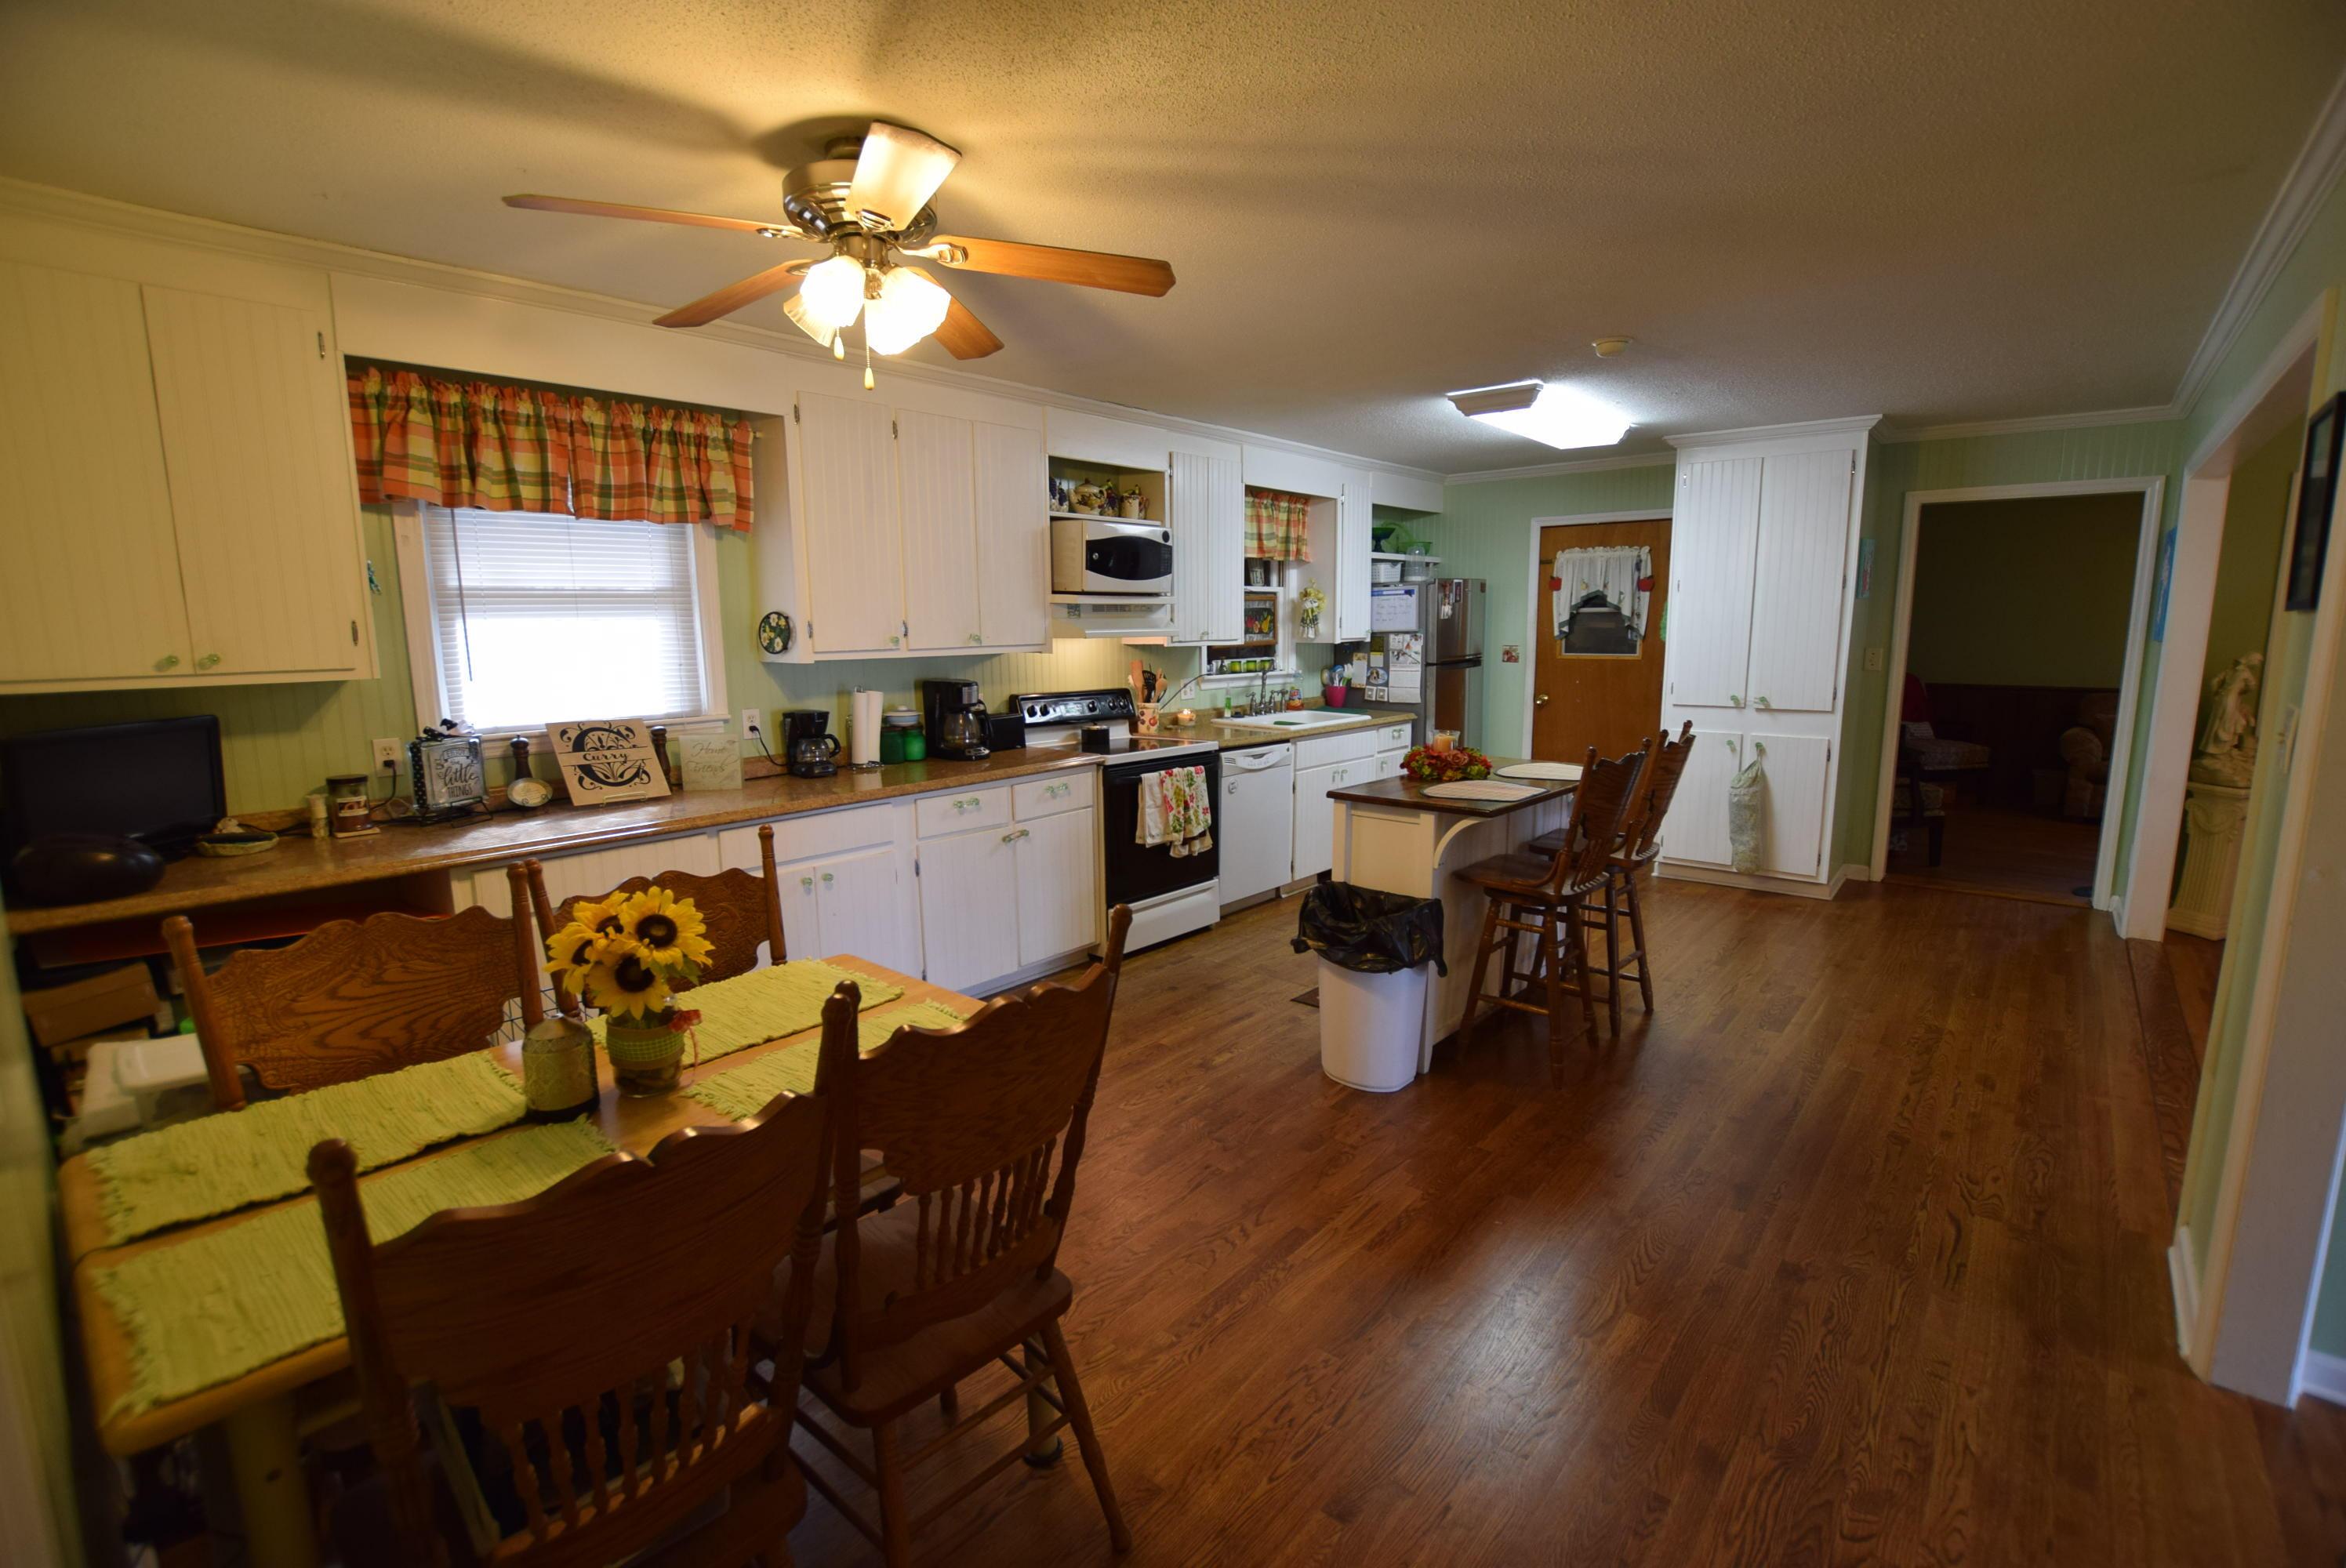 Summerville Homes For Sale - 2469 Hwy 17 A, Summerville, SC - 3